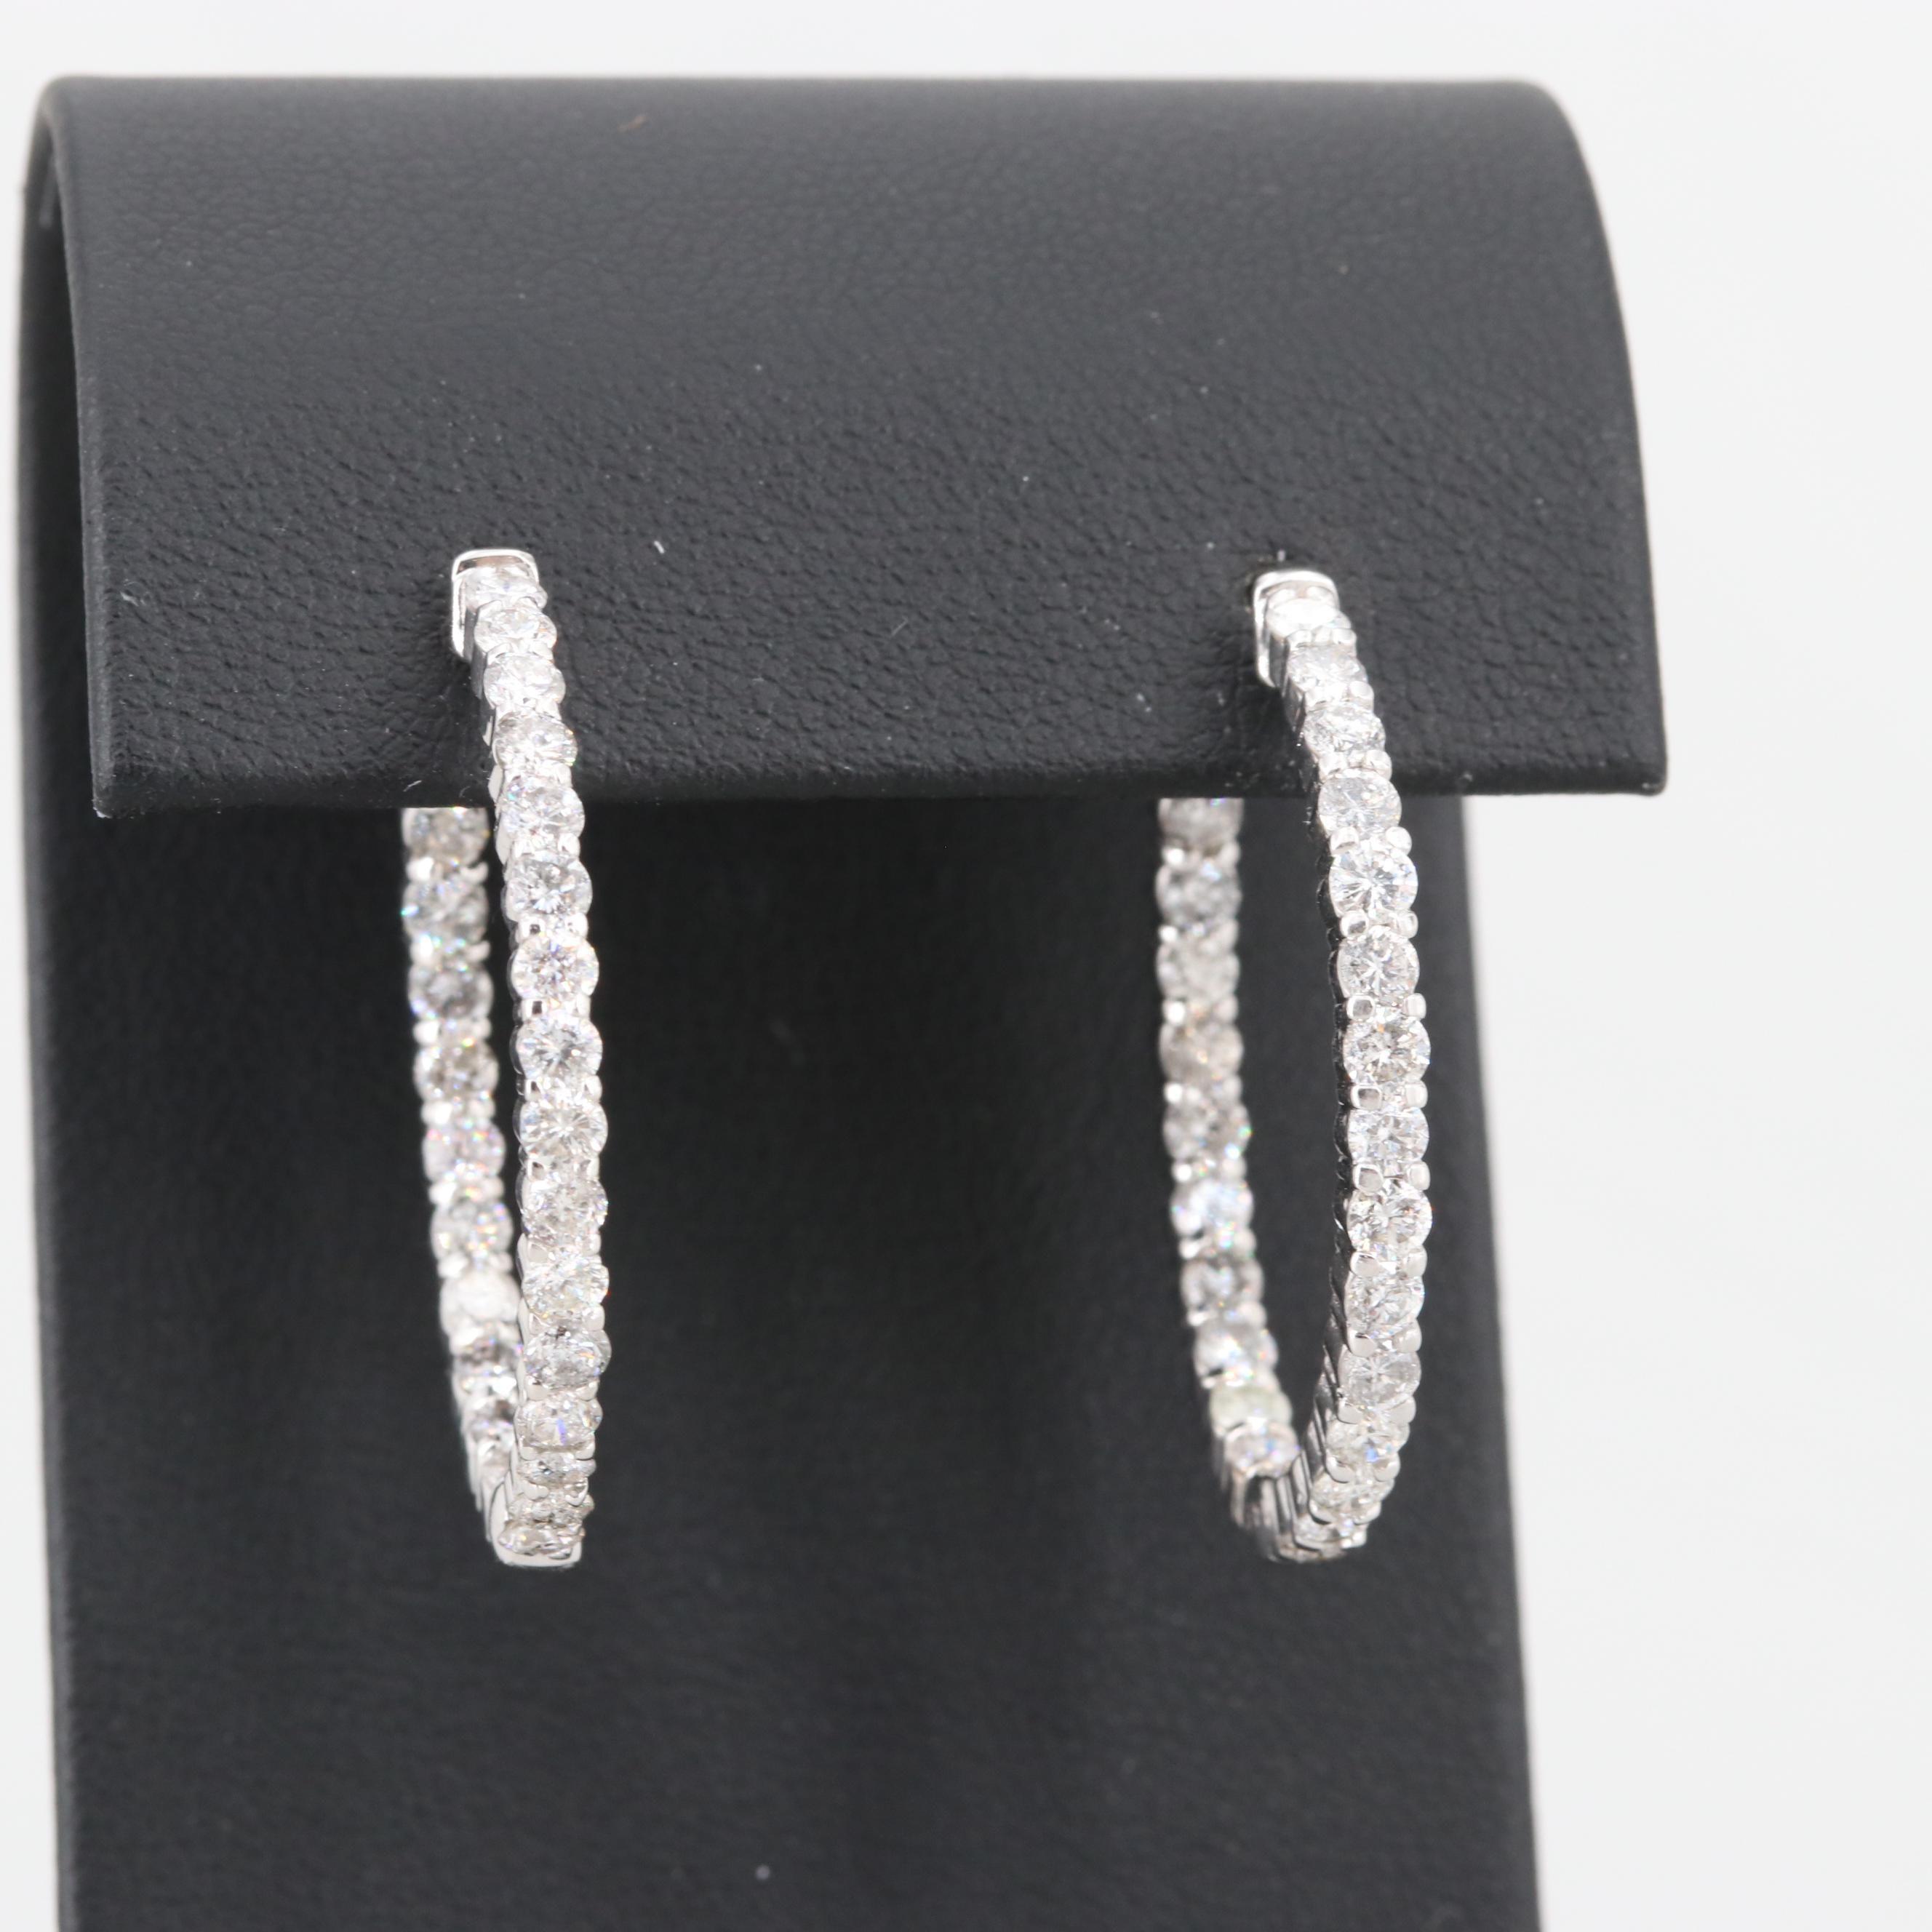 14K White Gold 3.00 CTW Diamond Inside-Out Hoop Earrings